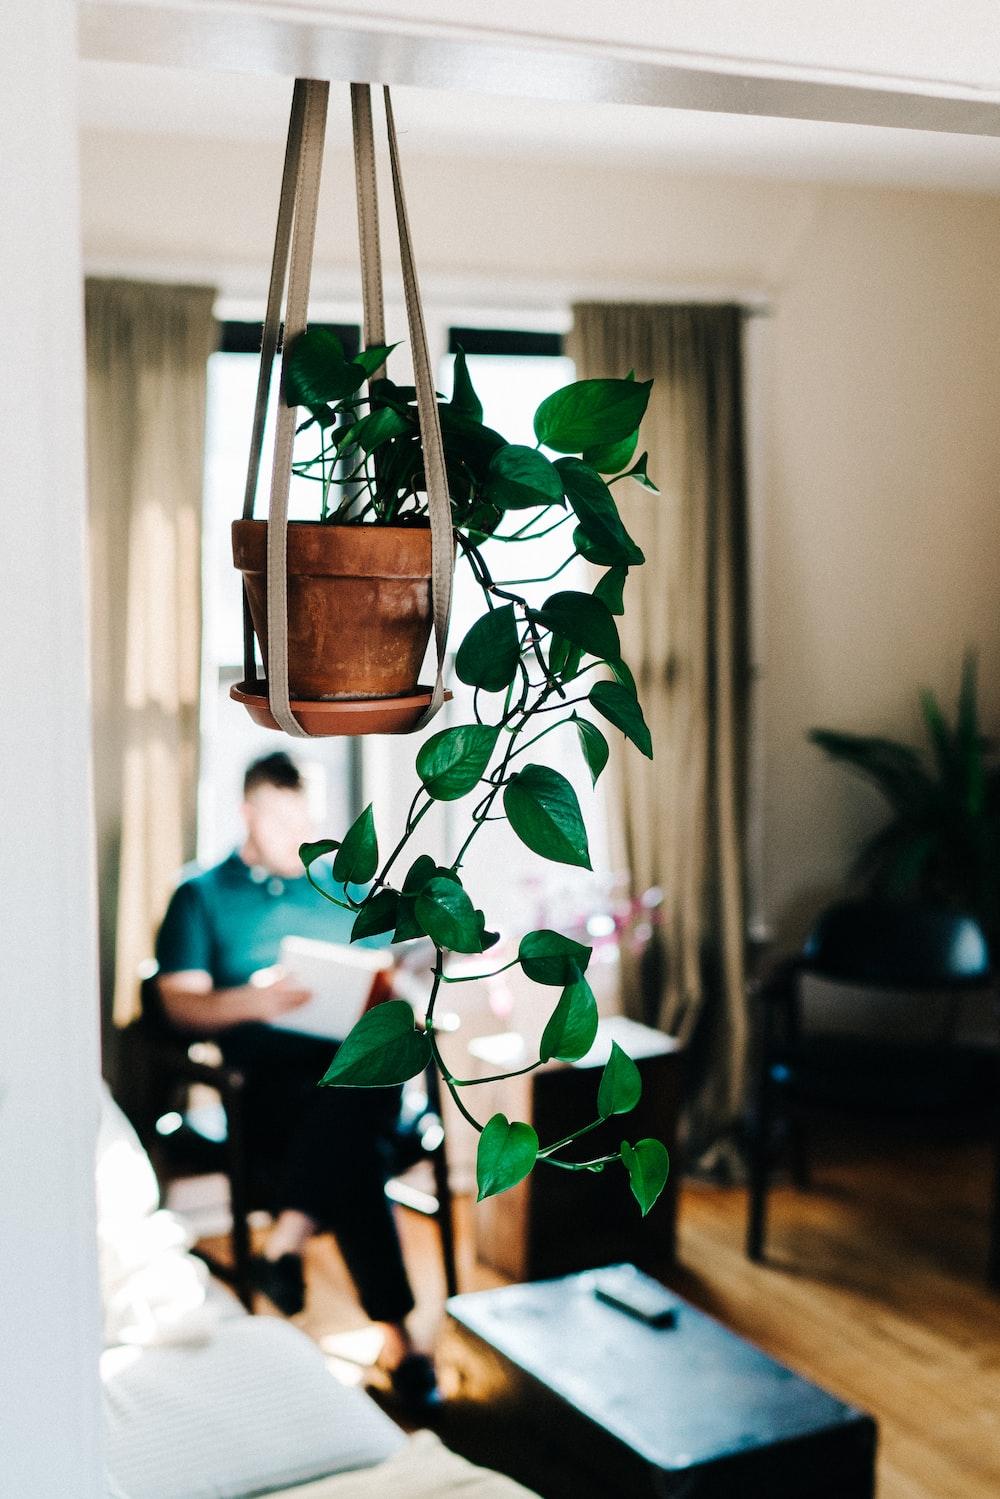 green leafy plant hanging on brown ceramic flowerpot